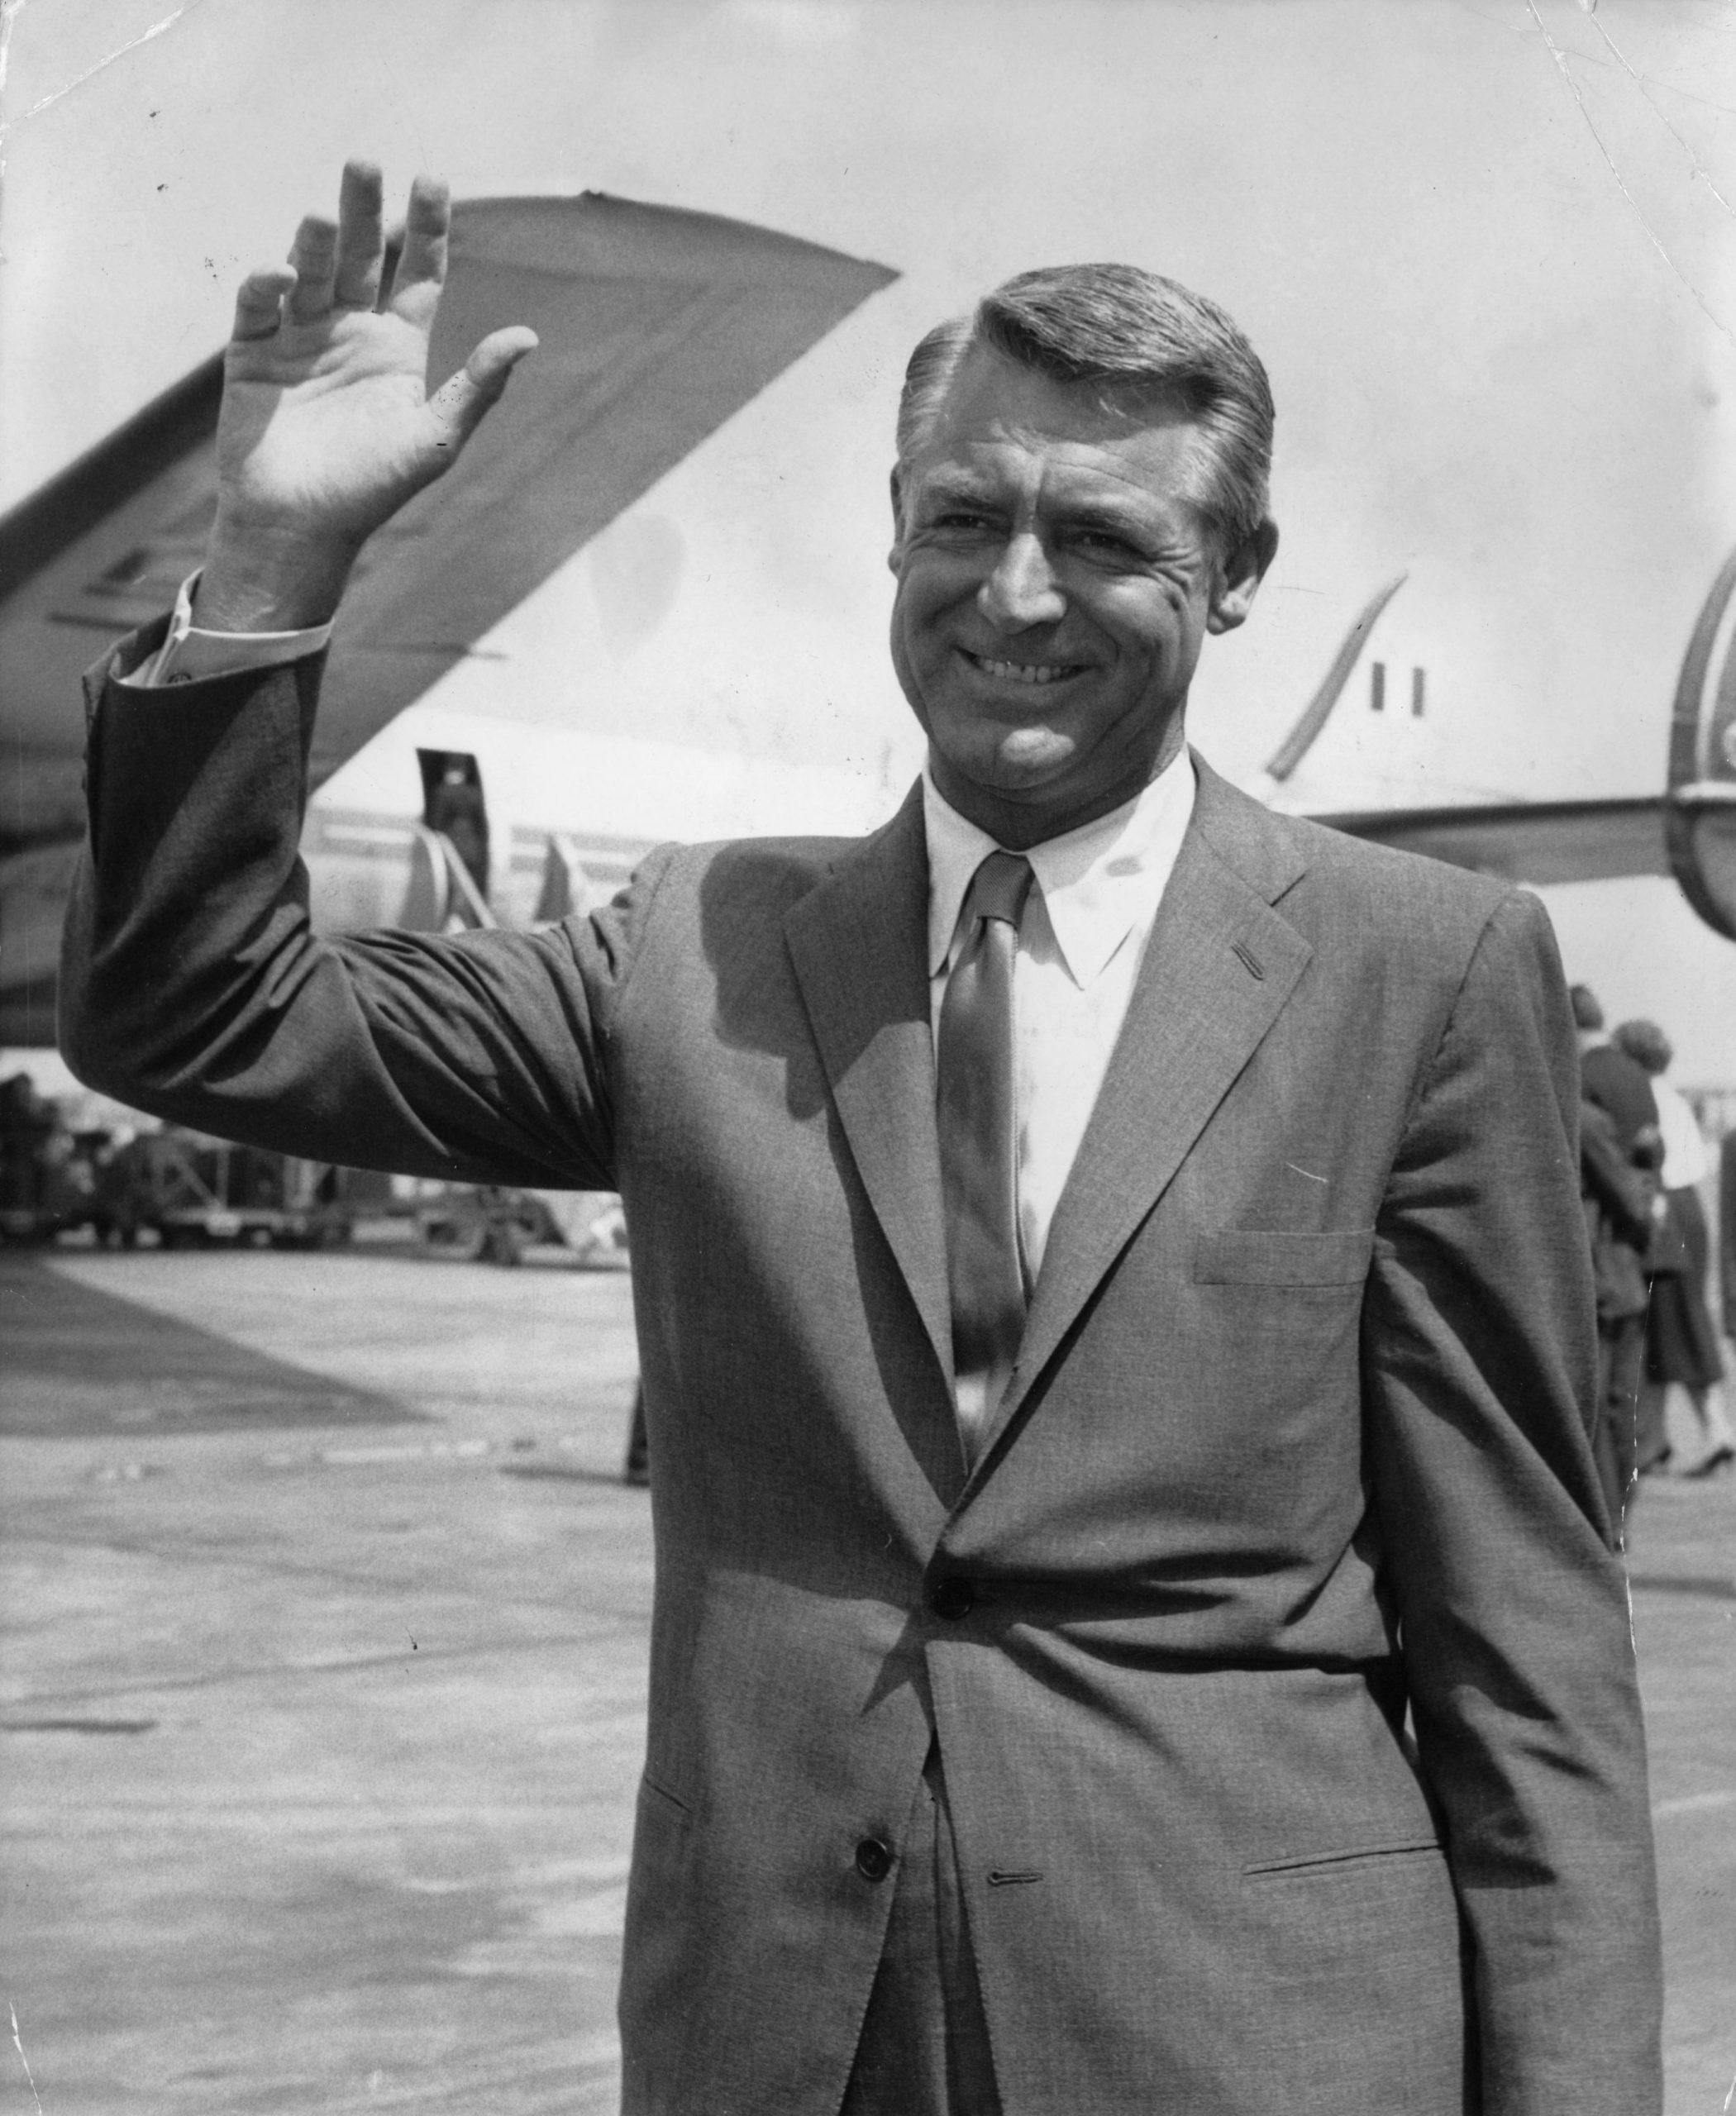 Cary Grant de camino al festival de Cannes para la presentación del film 'Operation Petticoat' / Foto: Getty Images